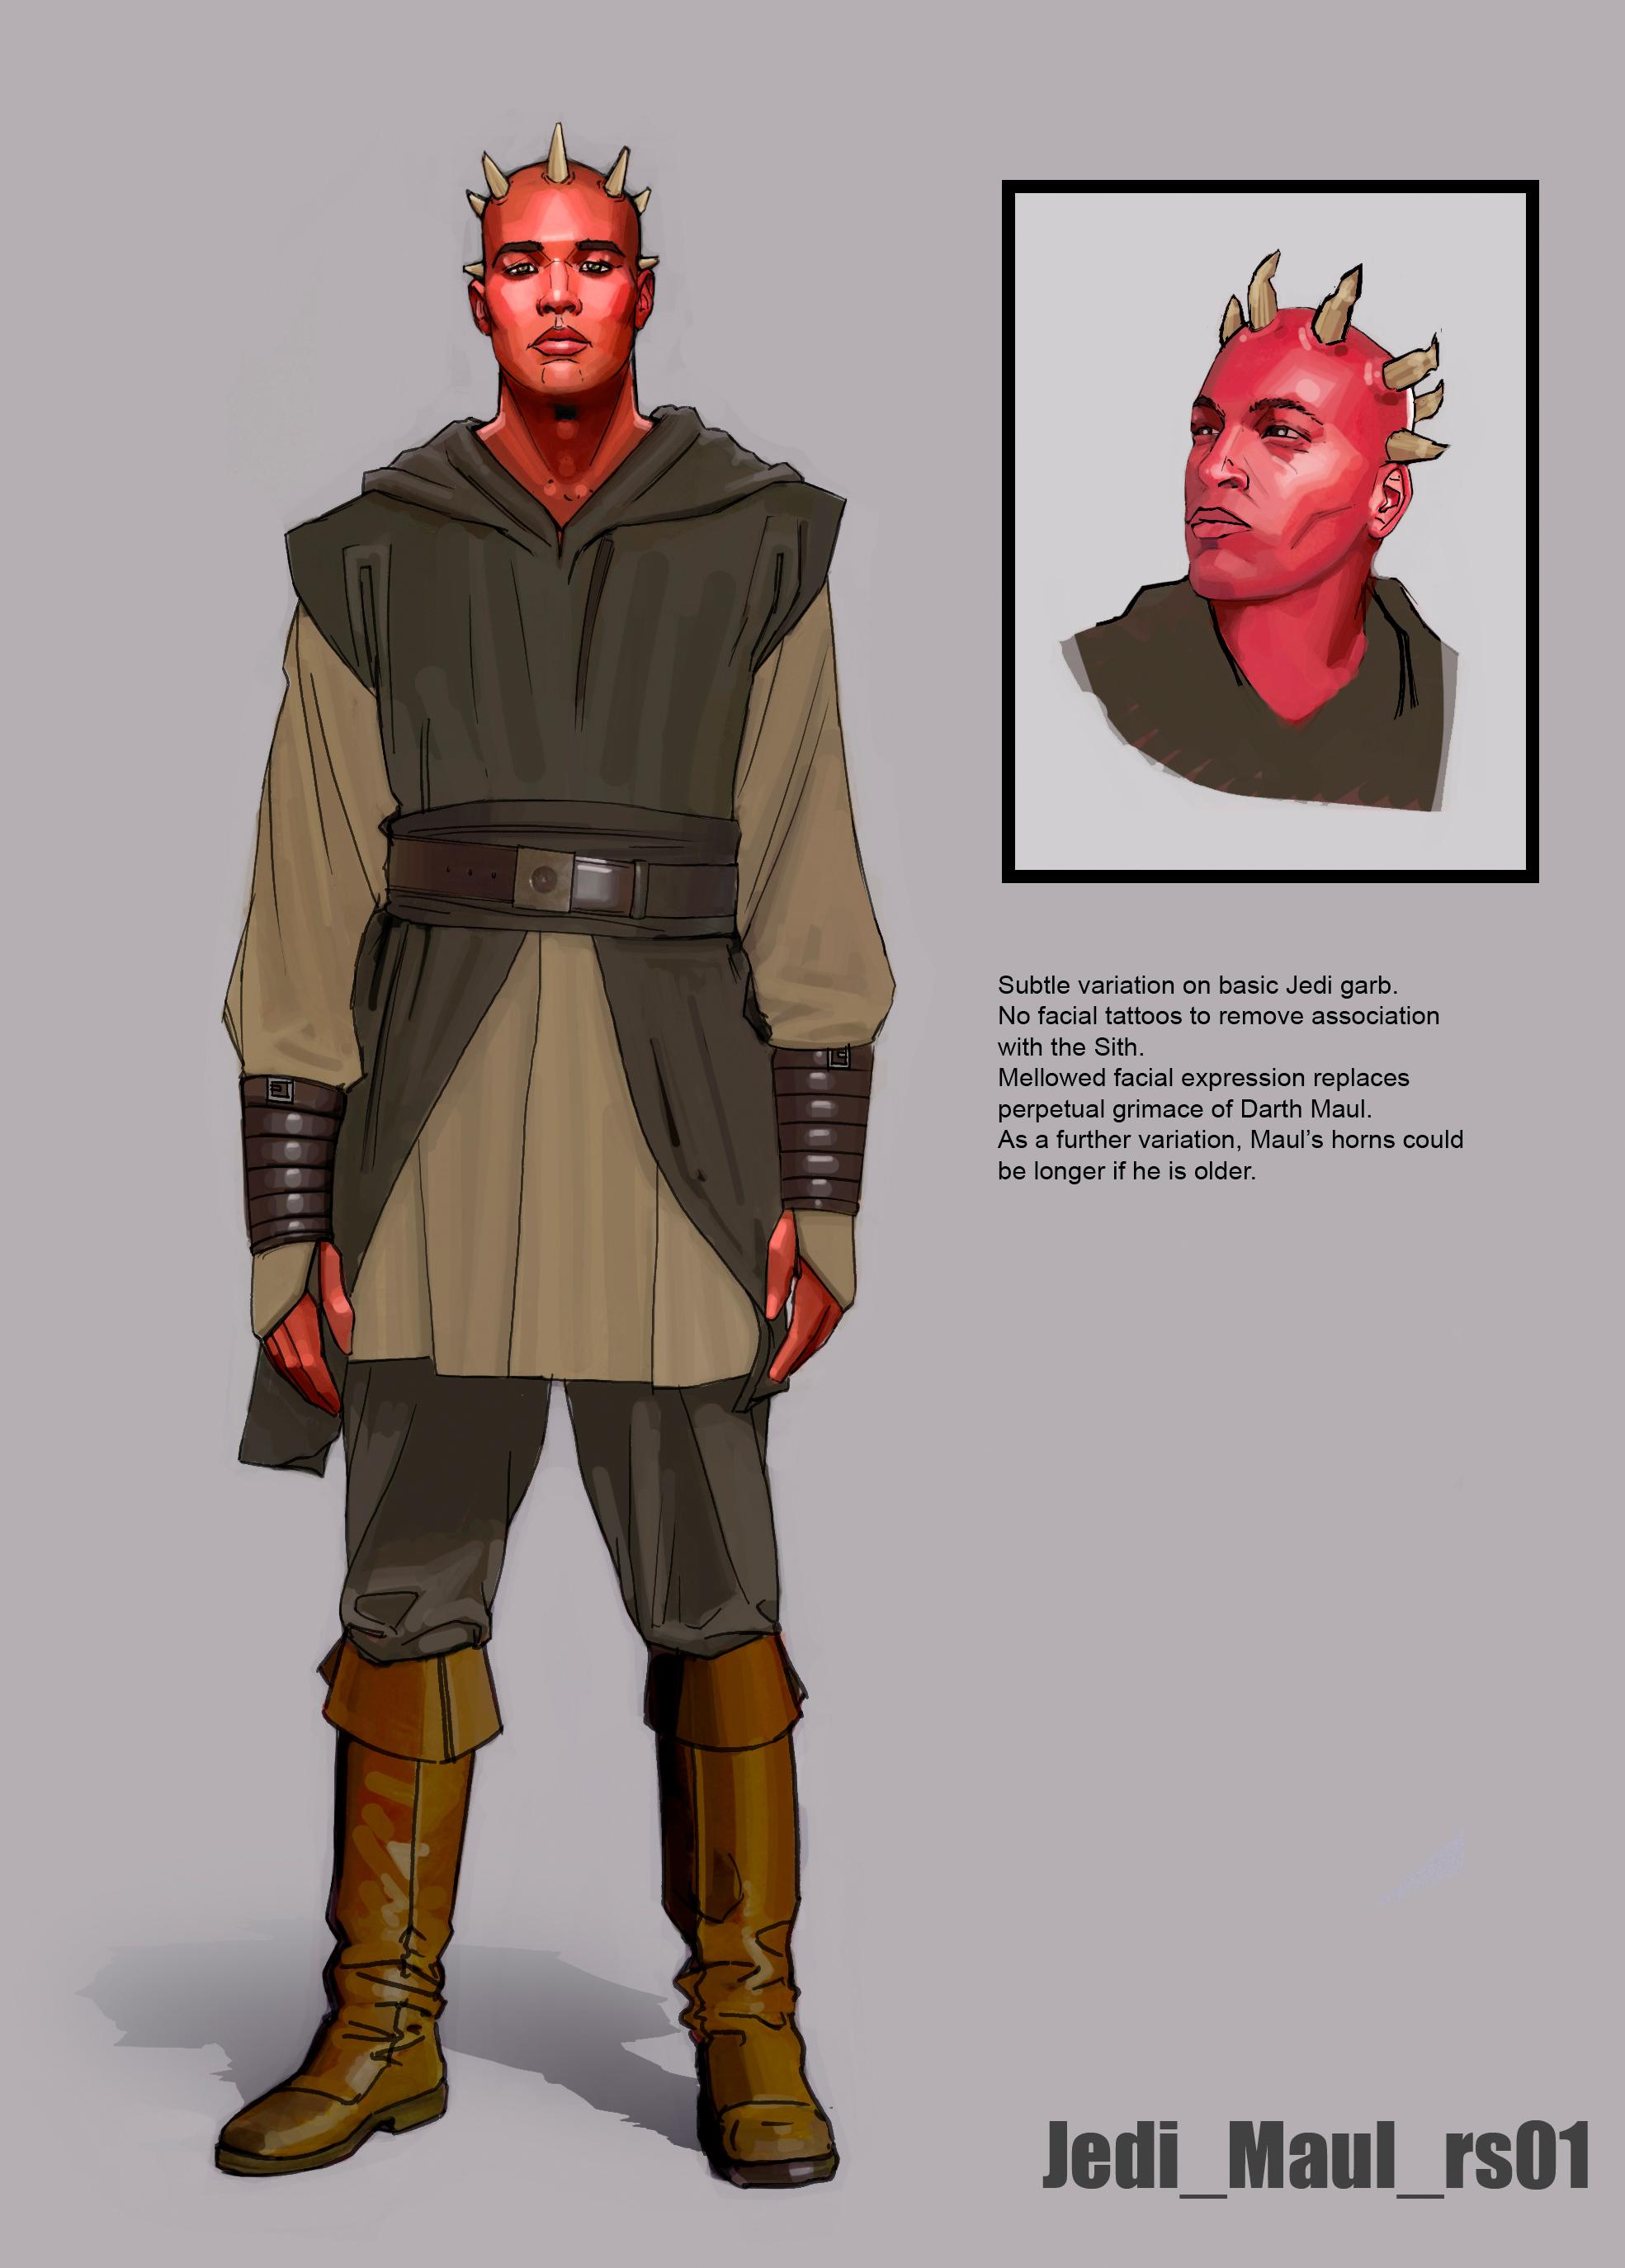 Star Wars Battlefront 4 Concept Art Twists the Entire Saga